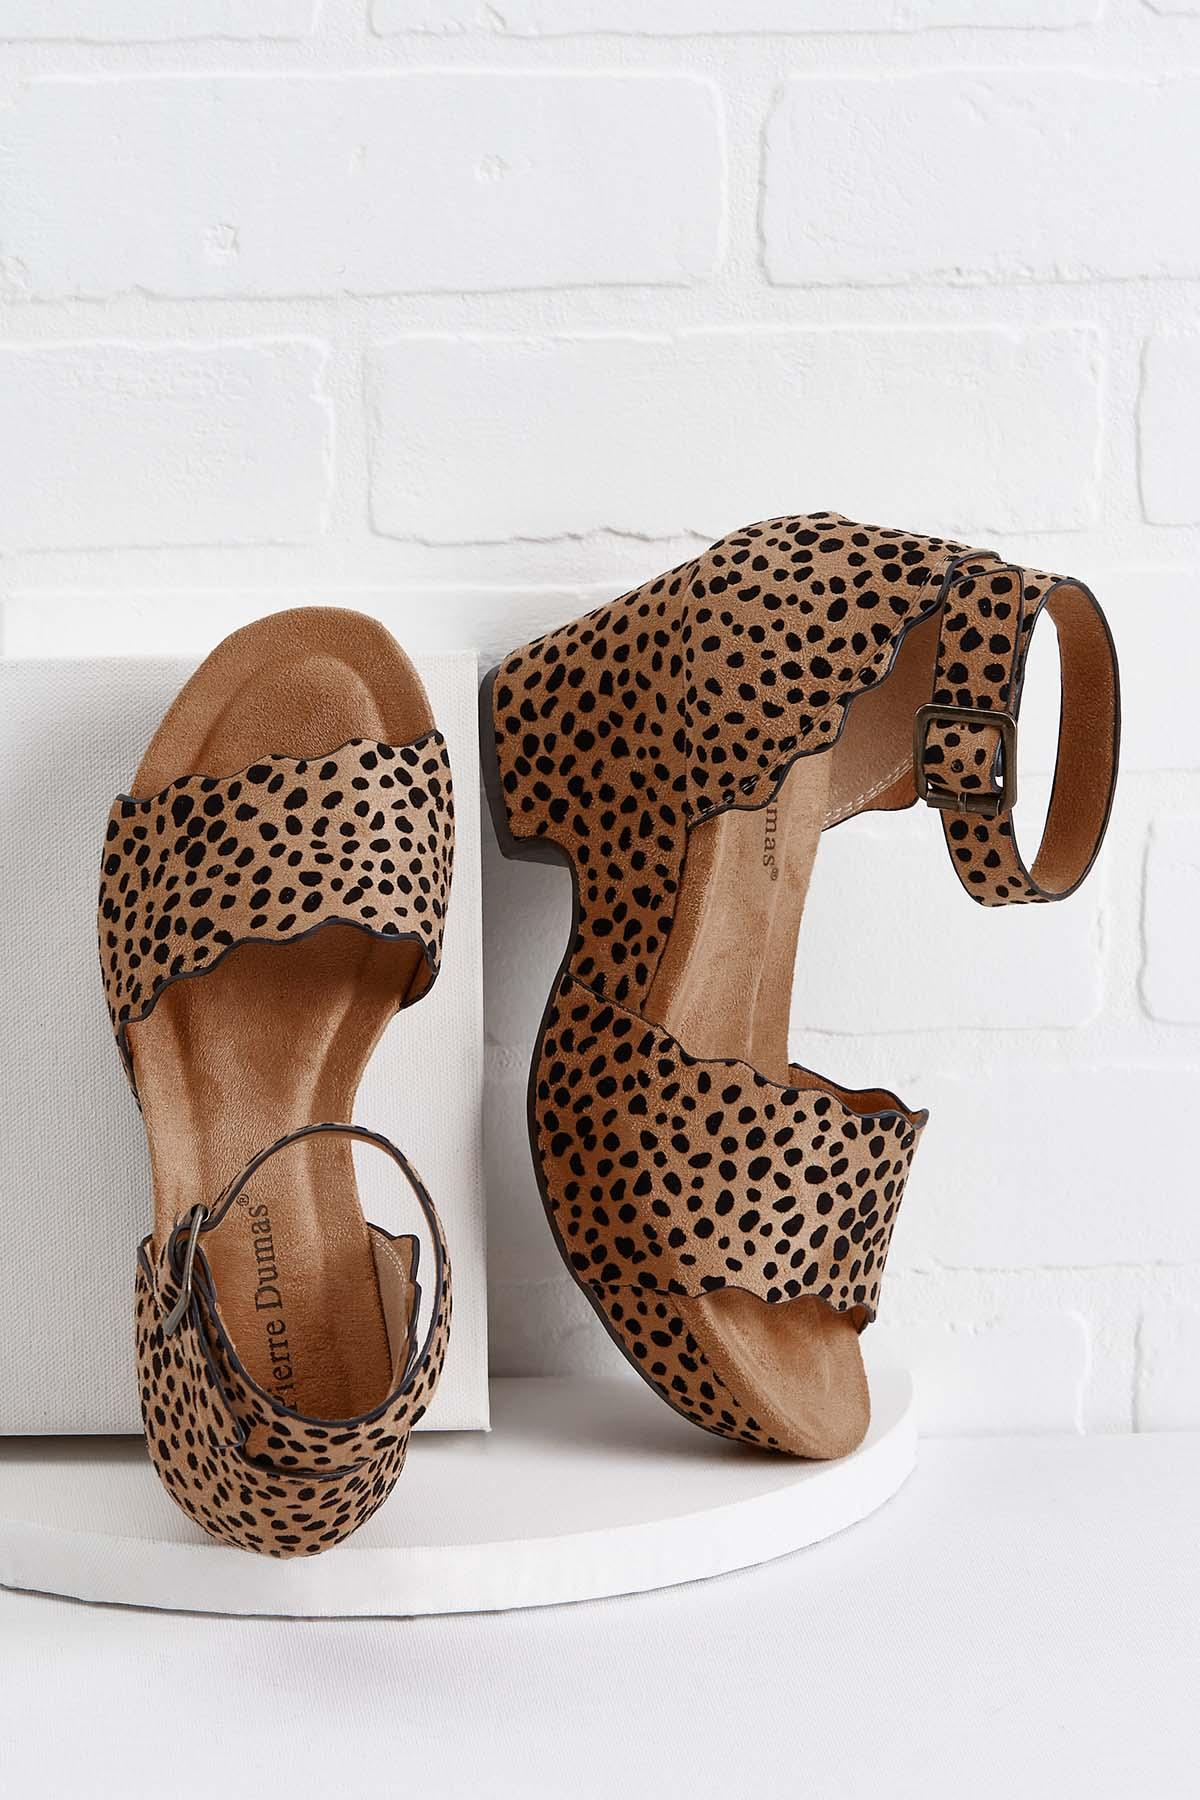 Cheetahlicious Notch Heels